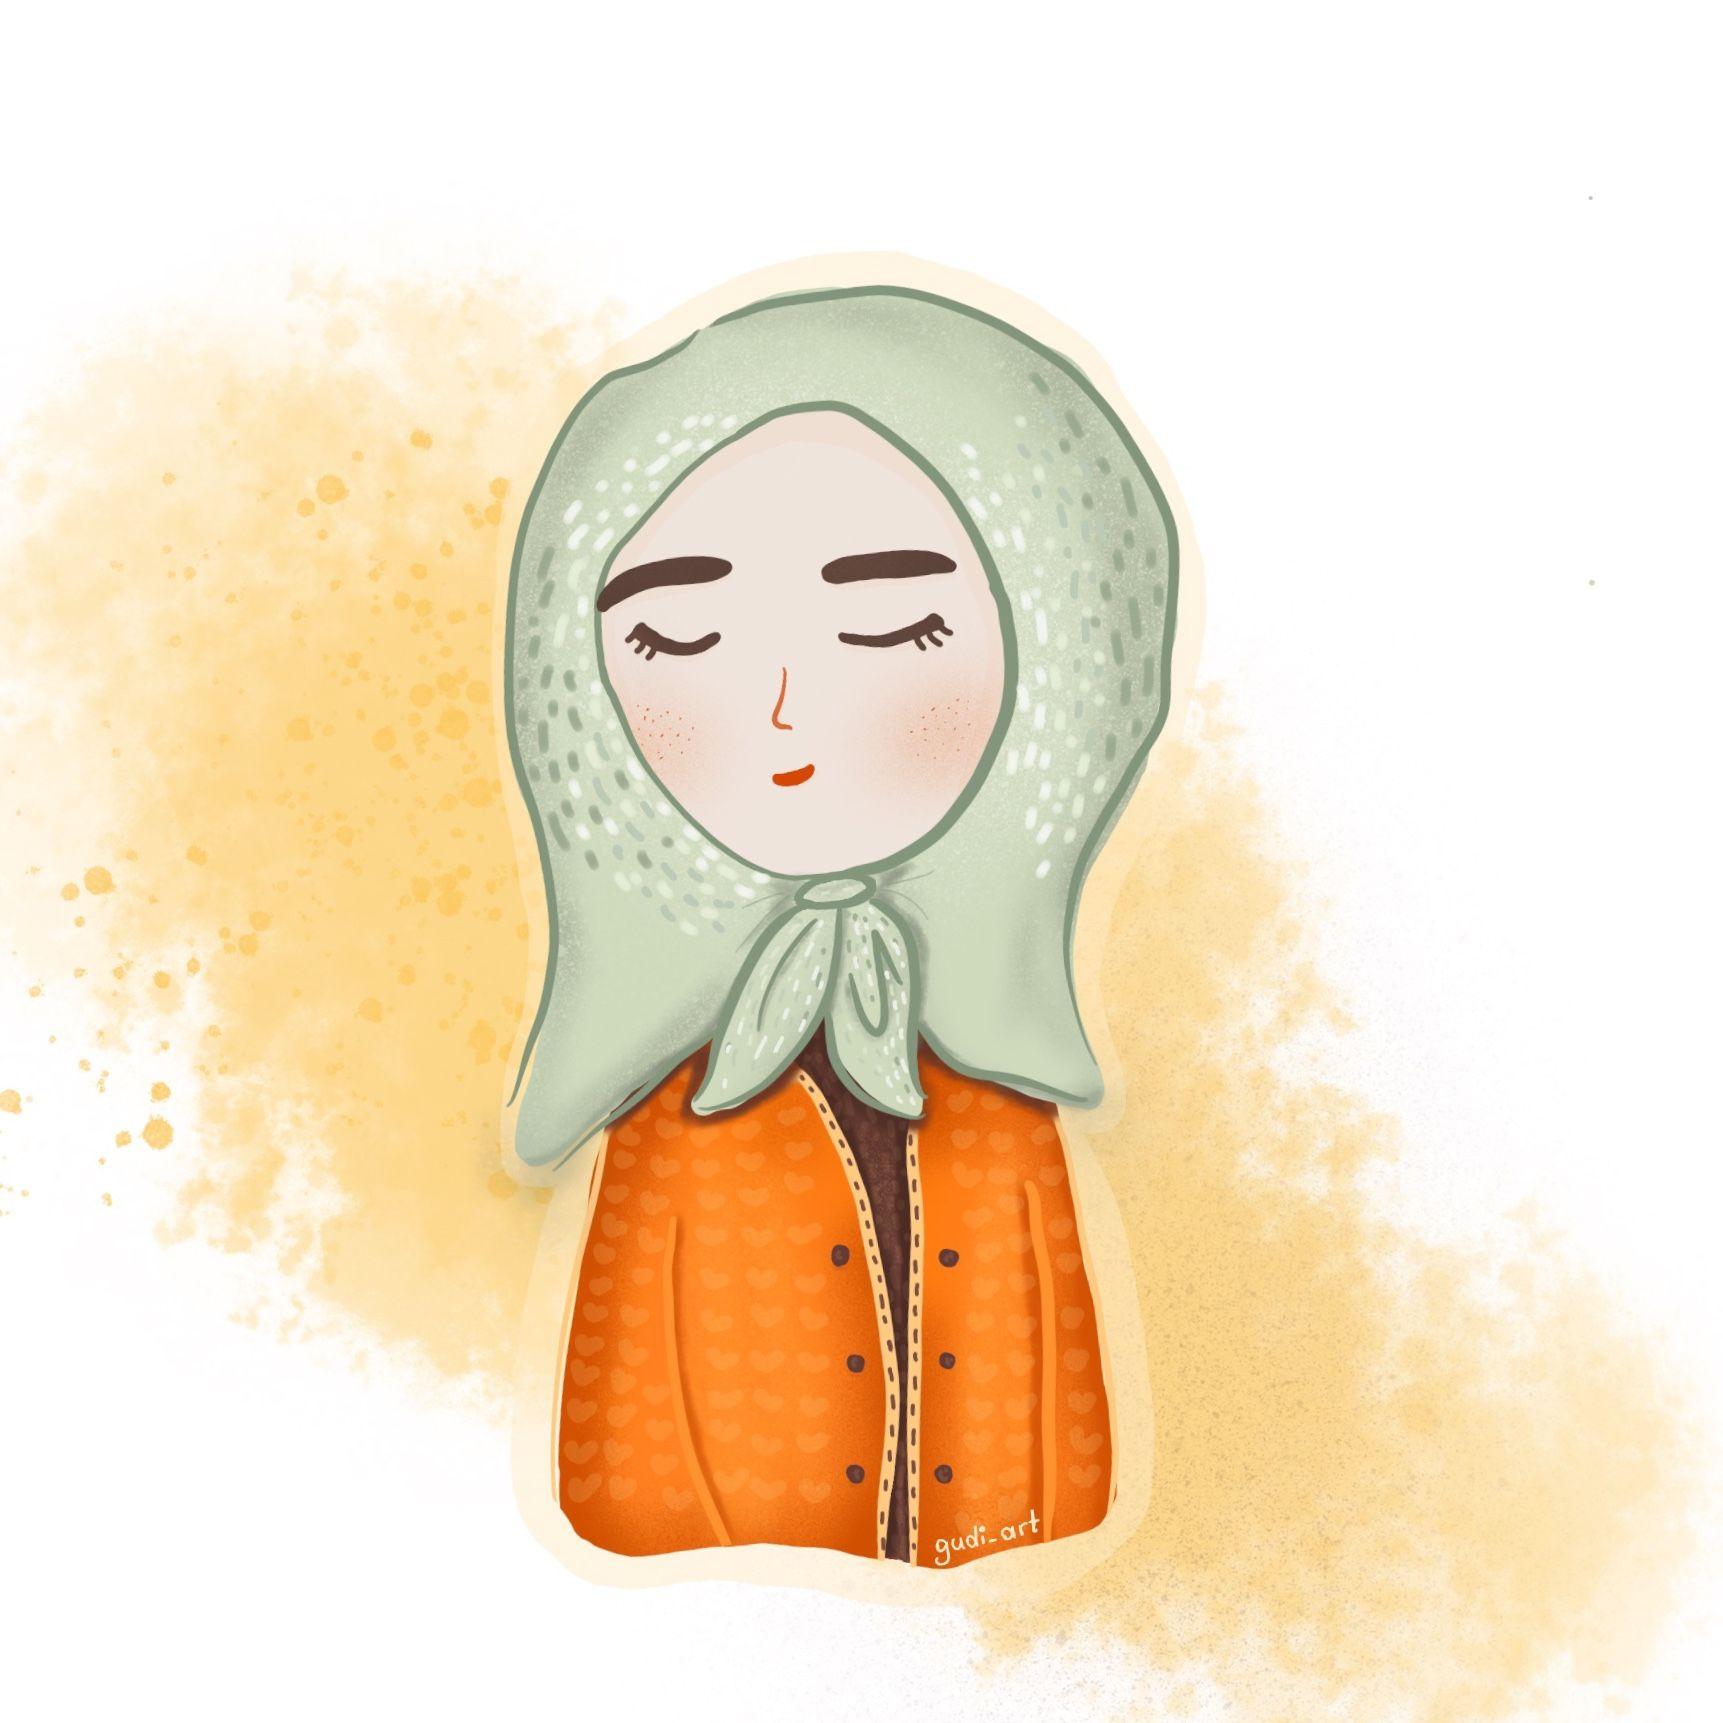 Muslim girl illustration from instagram gudi_art Islami